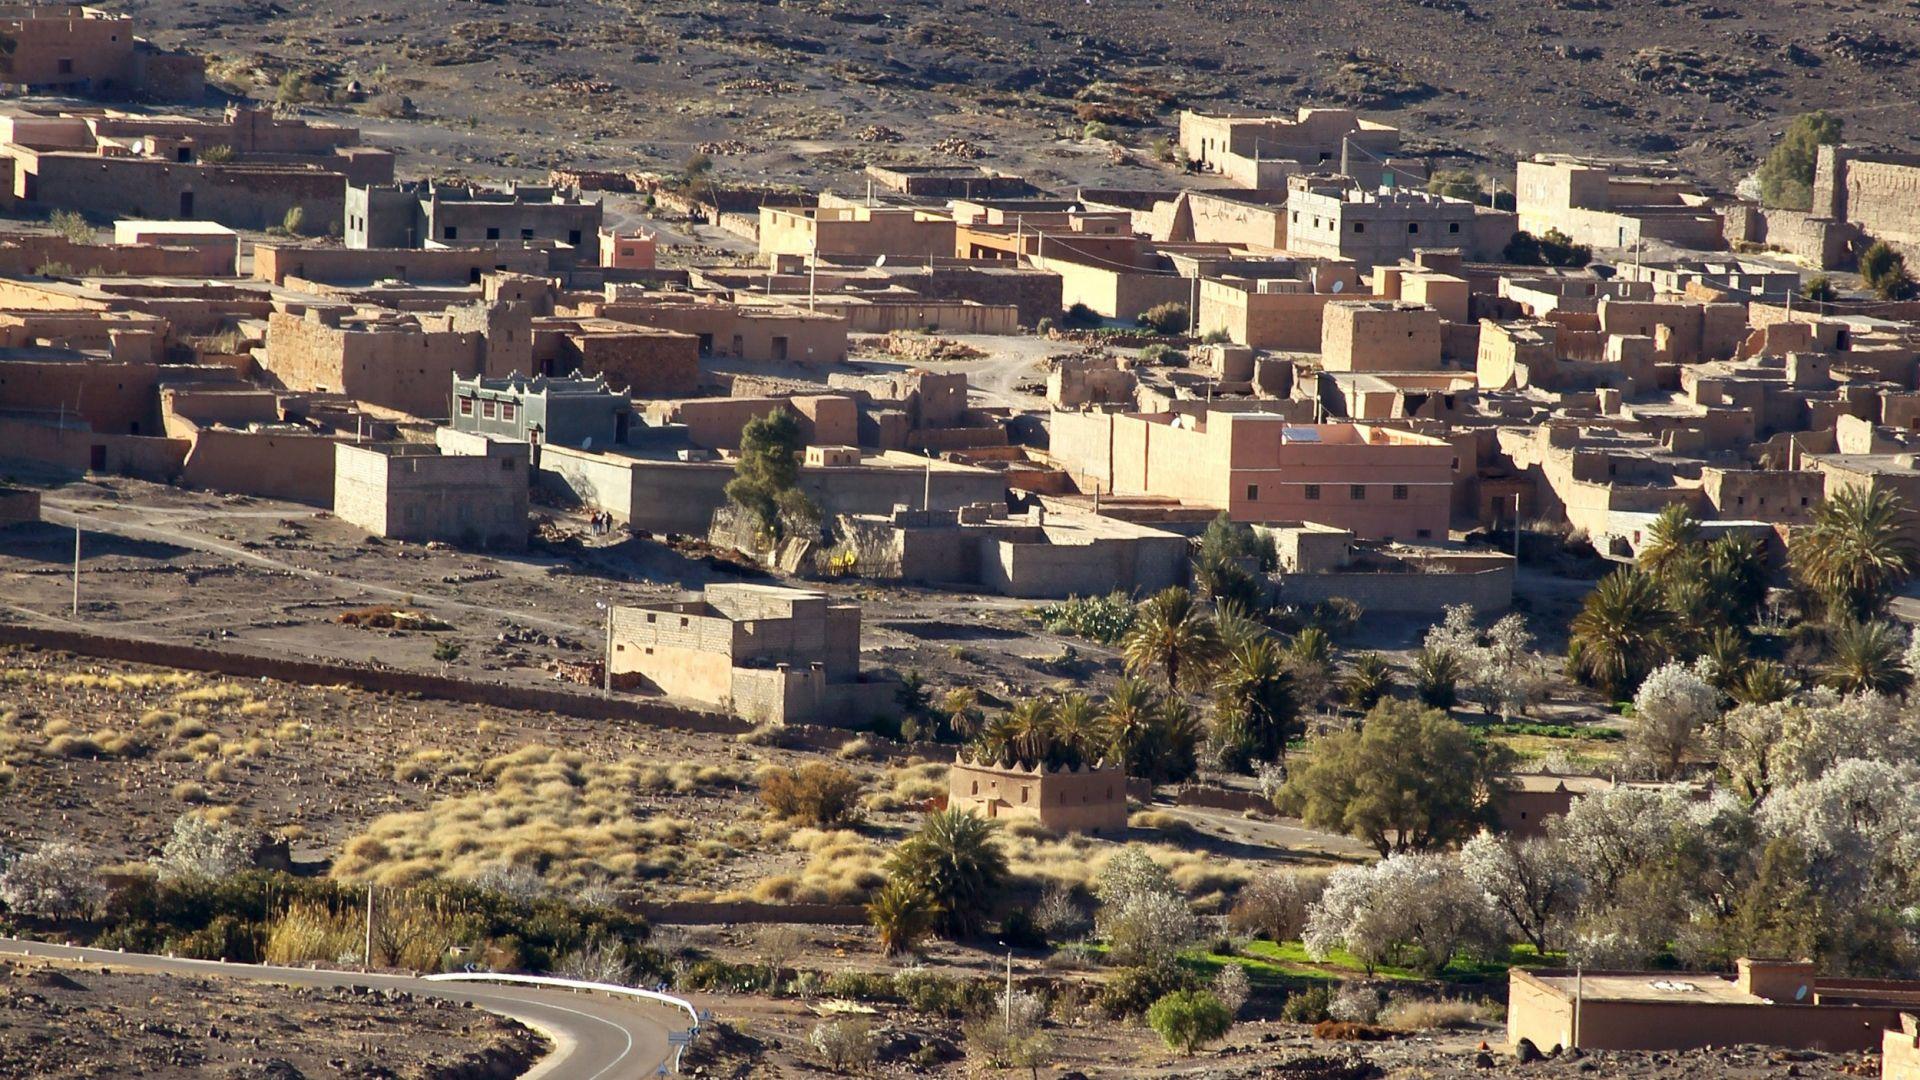 Immagine 87: In Marocco con la Yamaha Super Ténéré